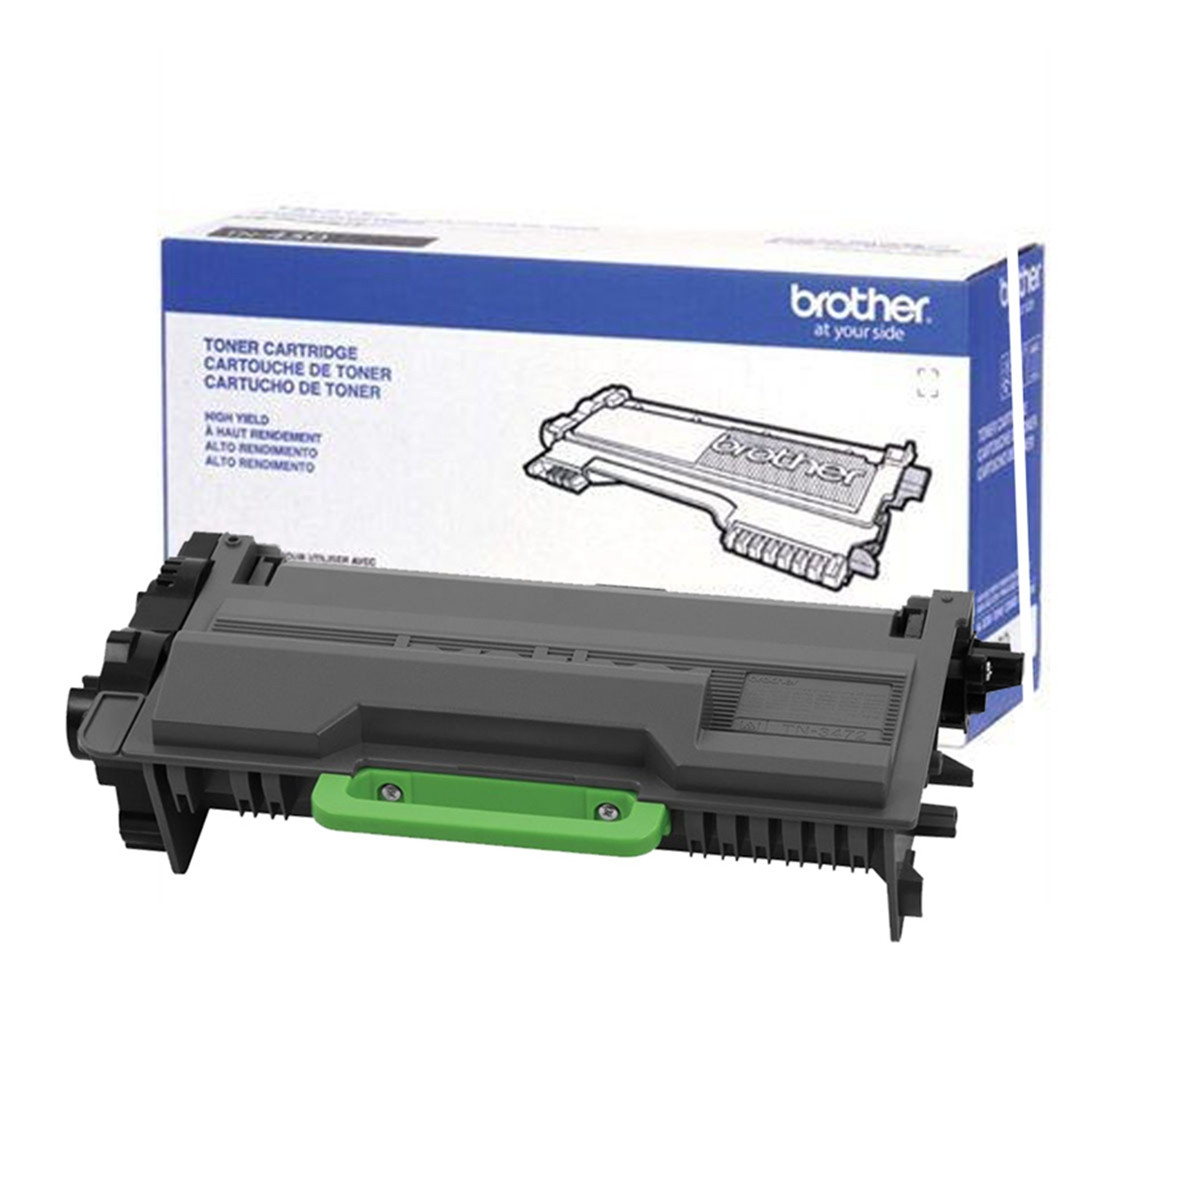 Toner Brother TN3442 TN3442BR   HL-L5102DW DCP-L5502DN DCP-L5652DN MFC-L5702DW   Original 8k